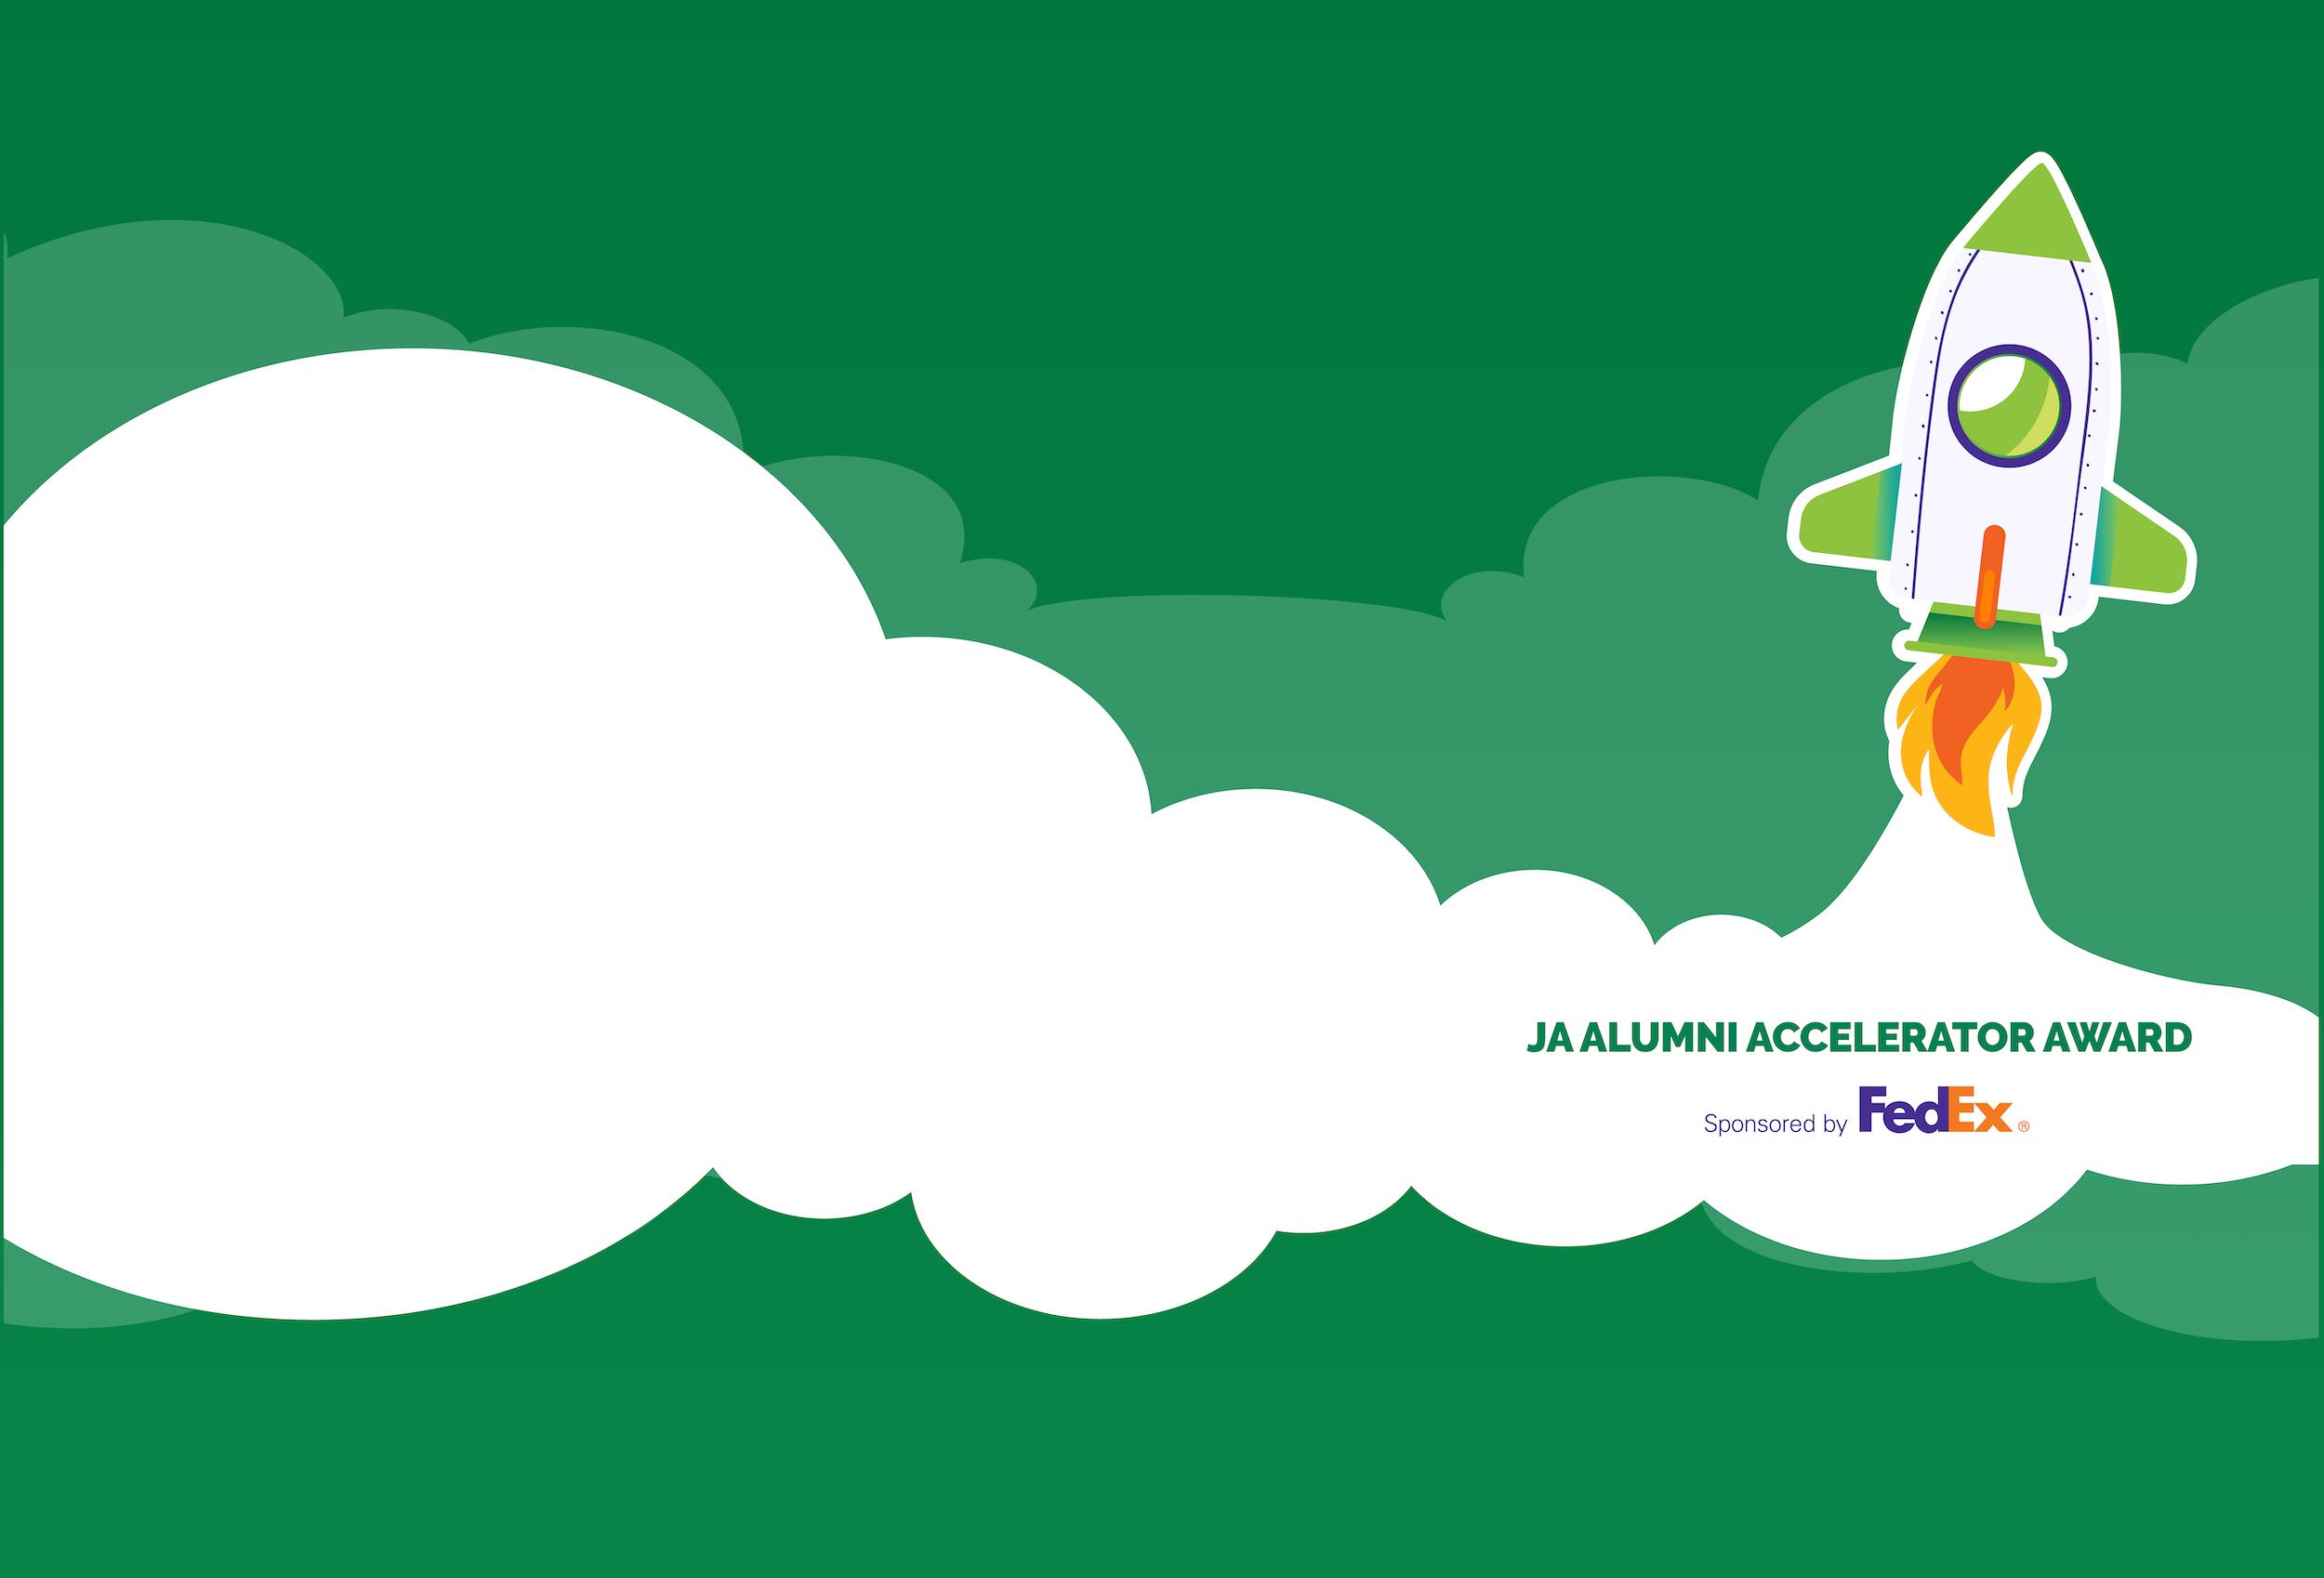 JA Alumni Accelerator Award web graphic-1.png